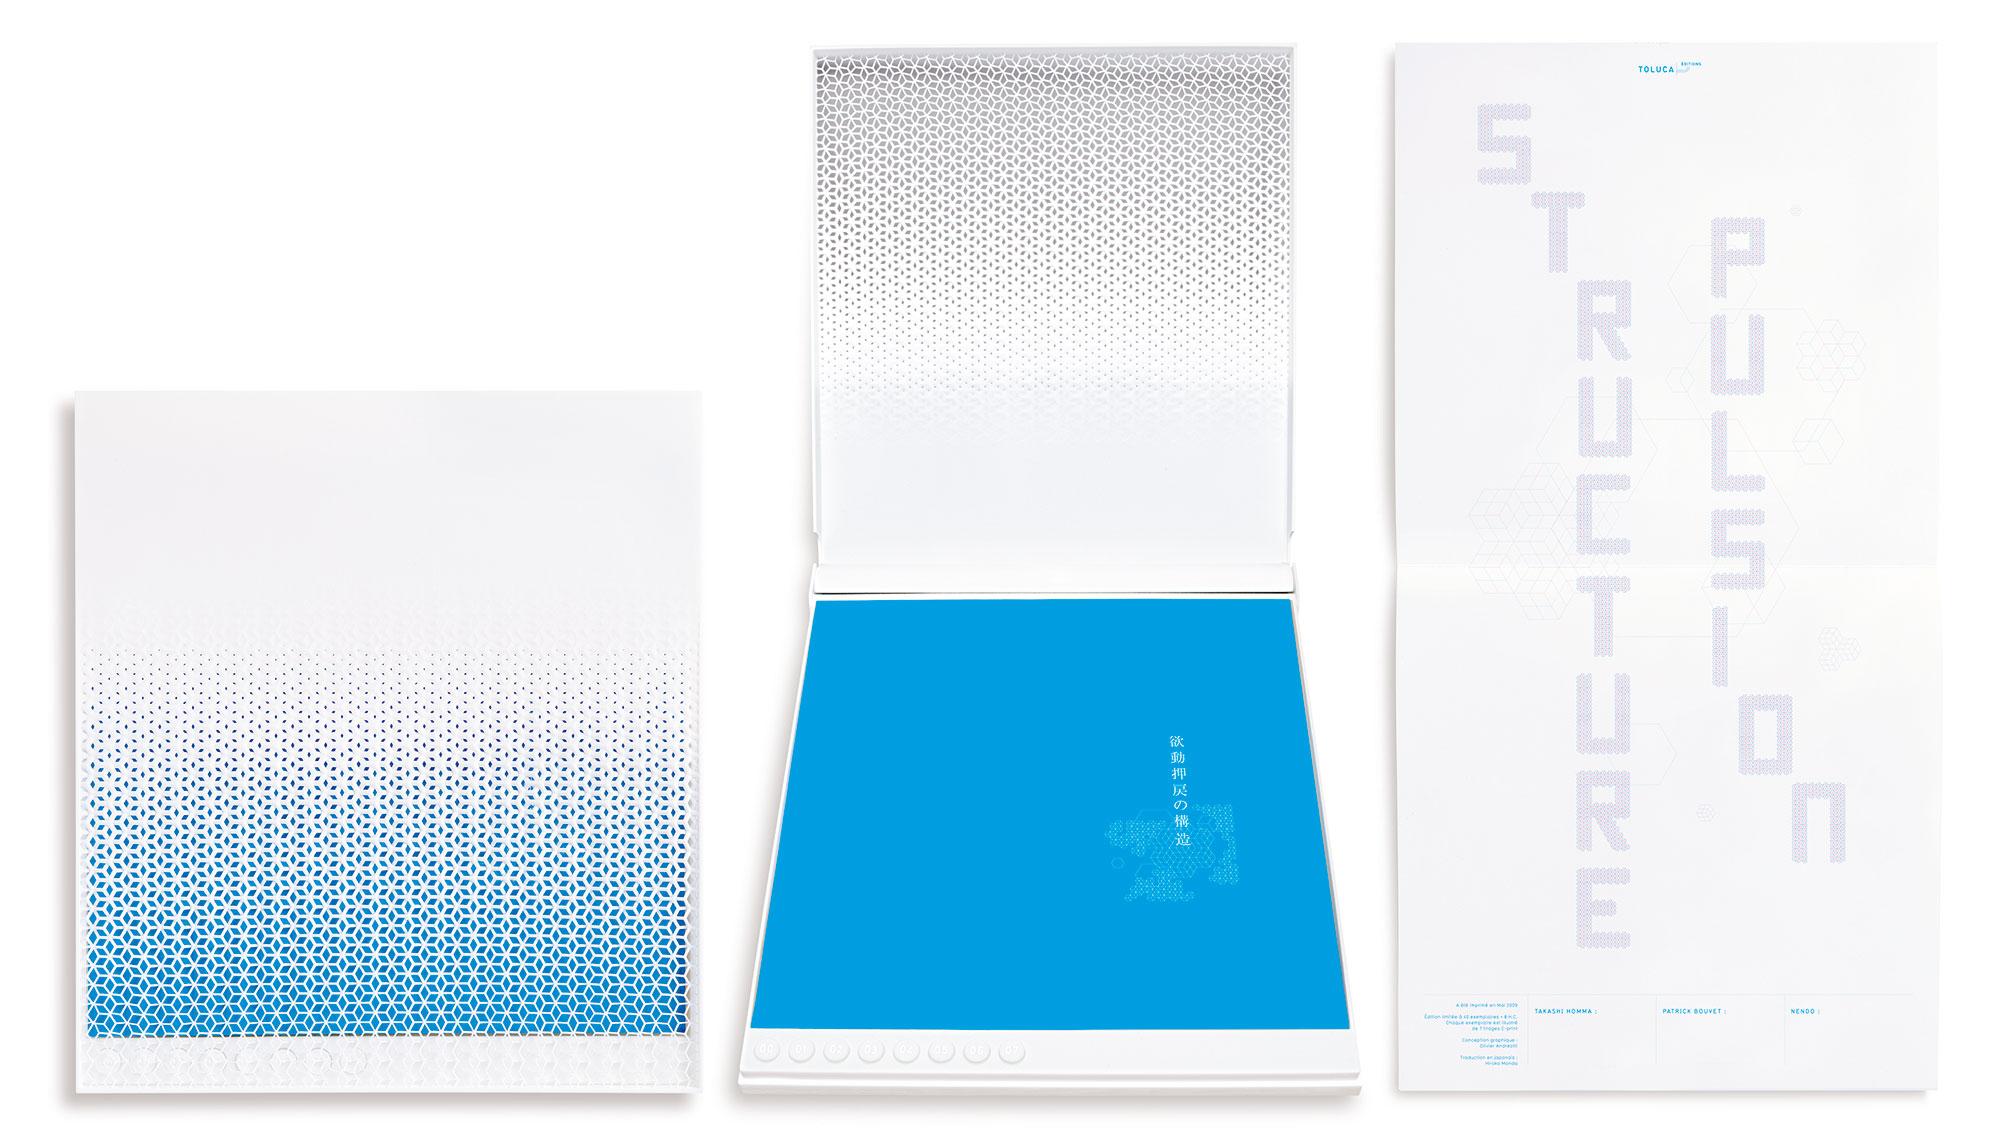 Takashi Homma ホンマタカシ (photos), Patrick Bouvet (text), Nendo (case), Structure Pulsion, 2009 (38 x 34 x 3,5 cm)